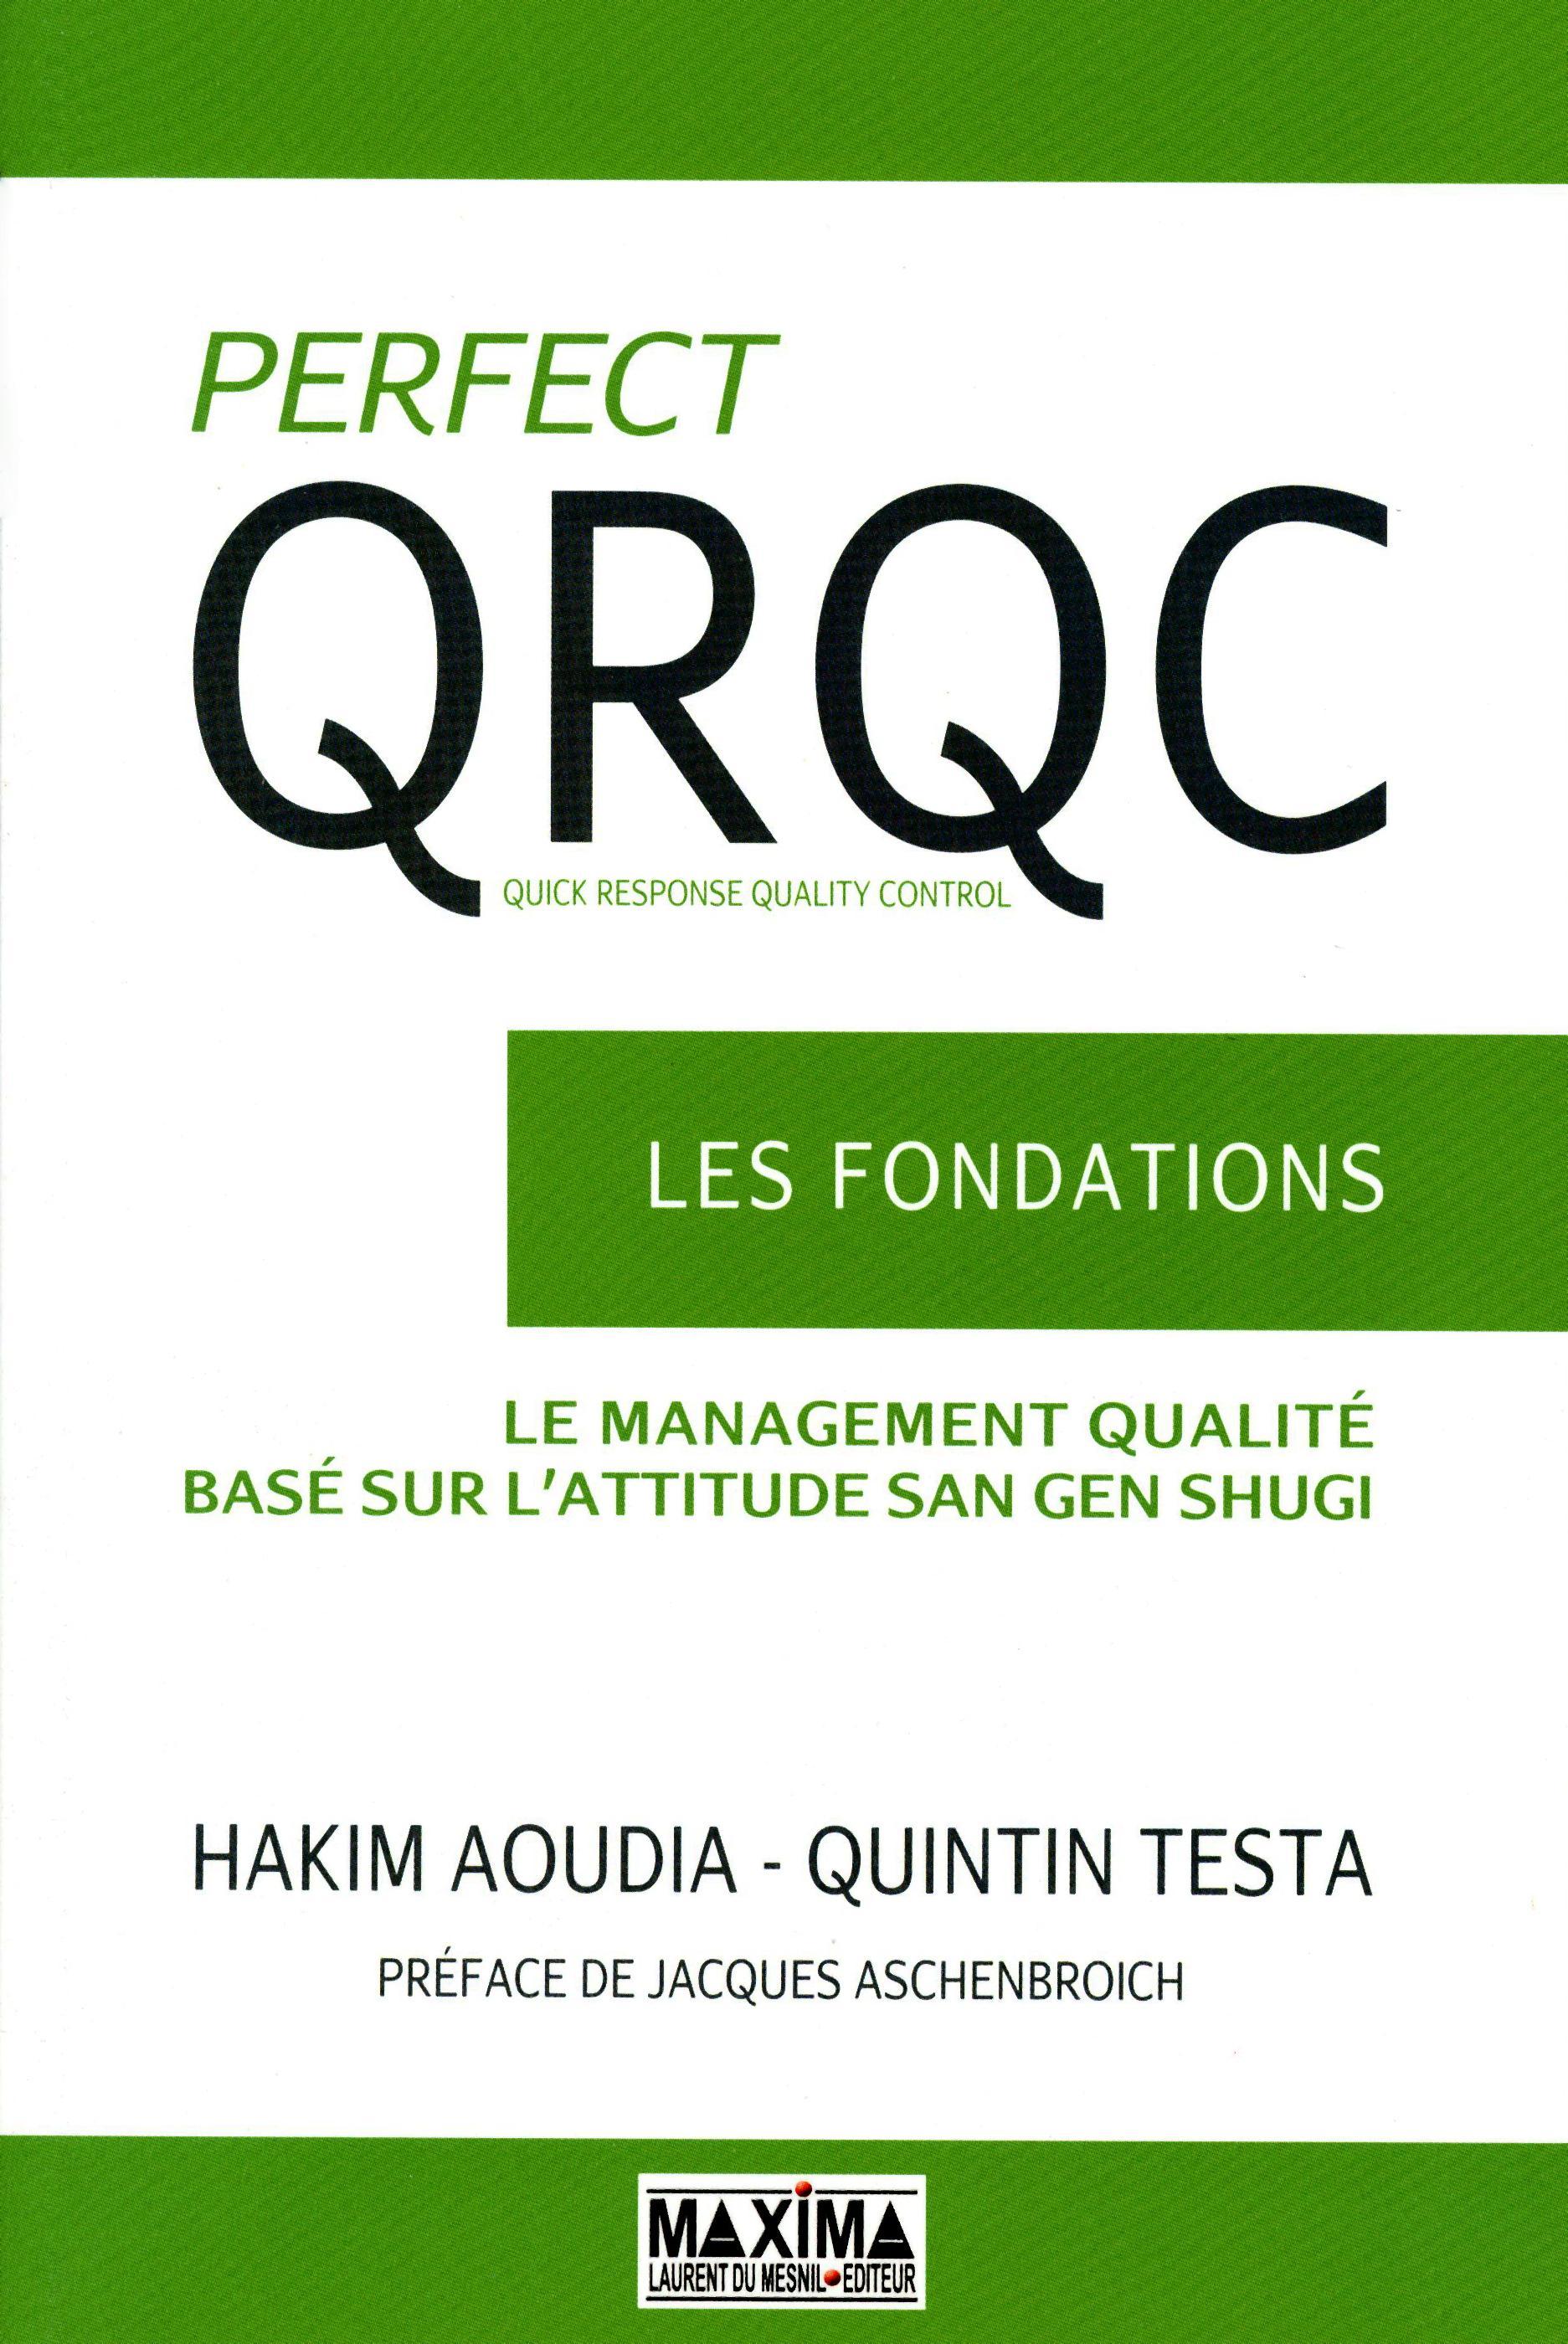 Perfect QRQC - vol 1 - Les fondations, QUICK RESPONSE QUALITY CONTROL - LA MANAGEMENT QUALITÉ BASÉ SUR L'ATTITUDE SAN GEN SHUGI